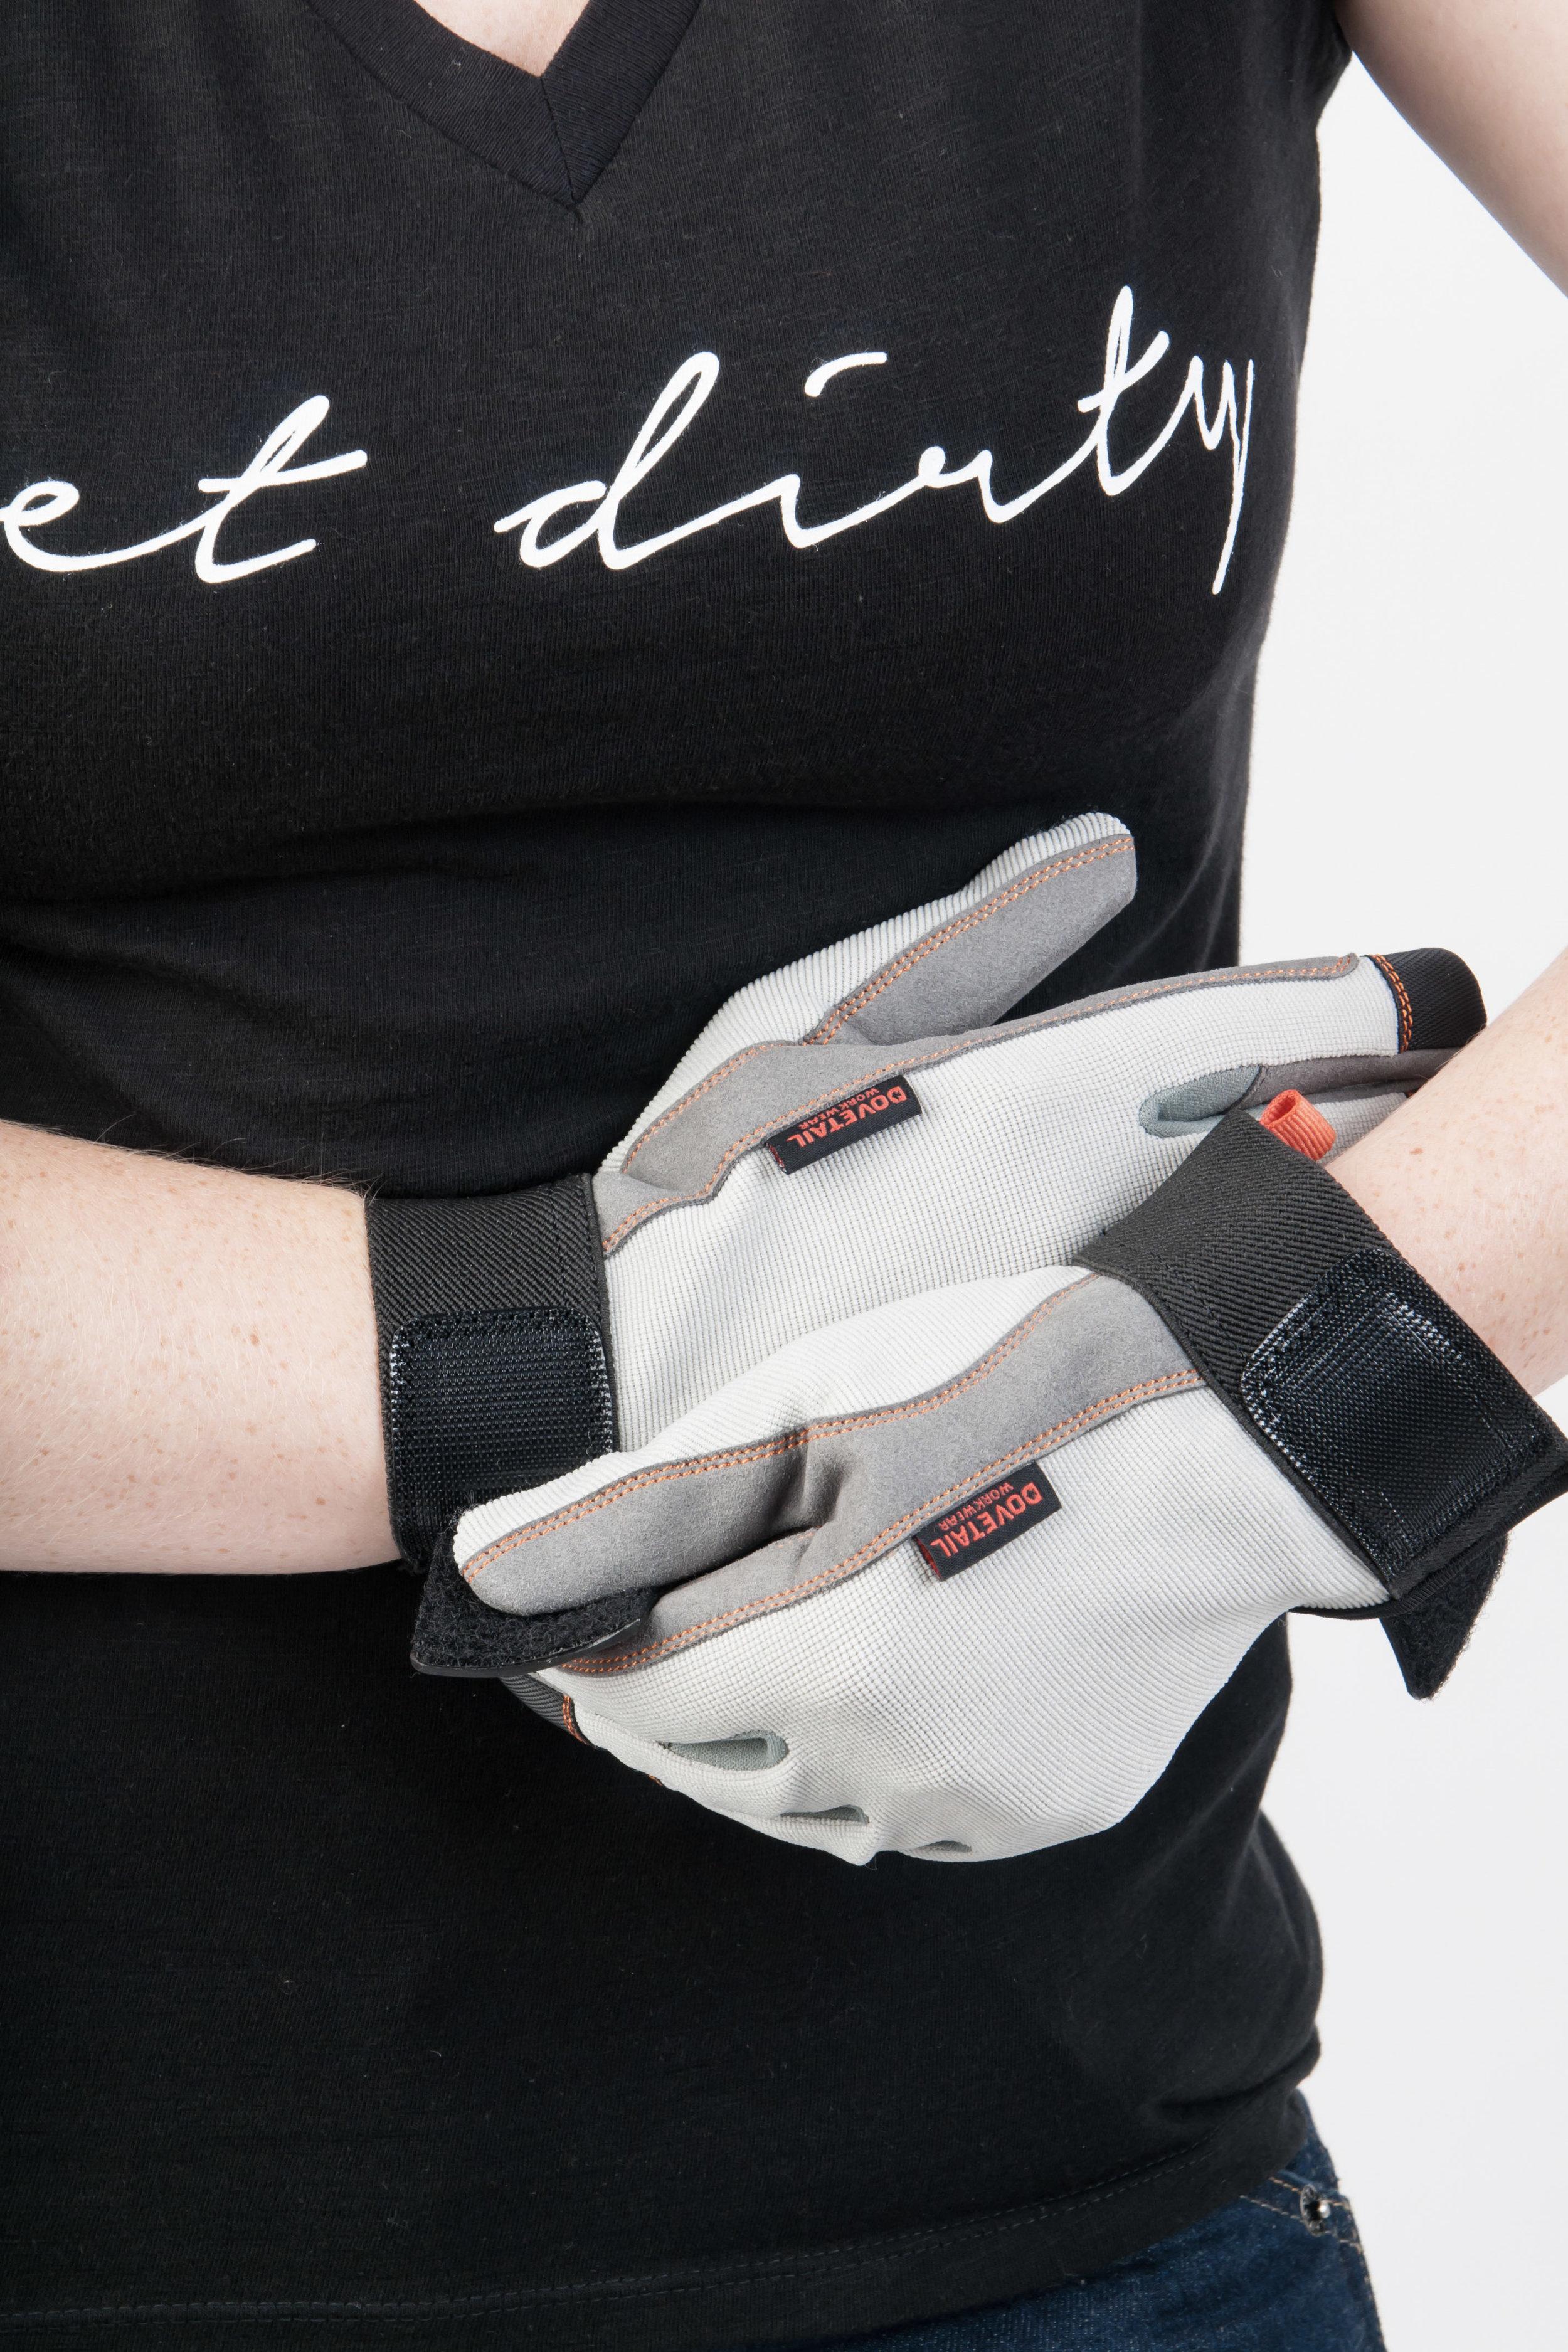 Multipurpose Work Glove